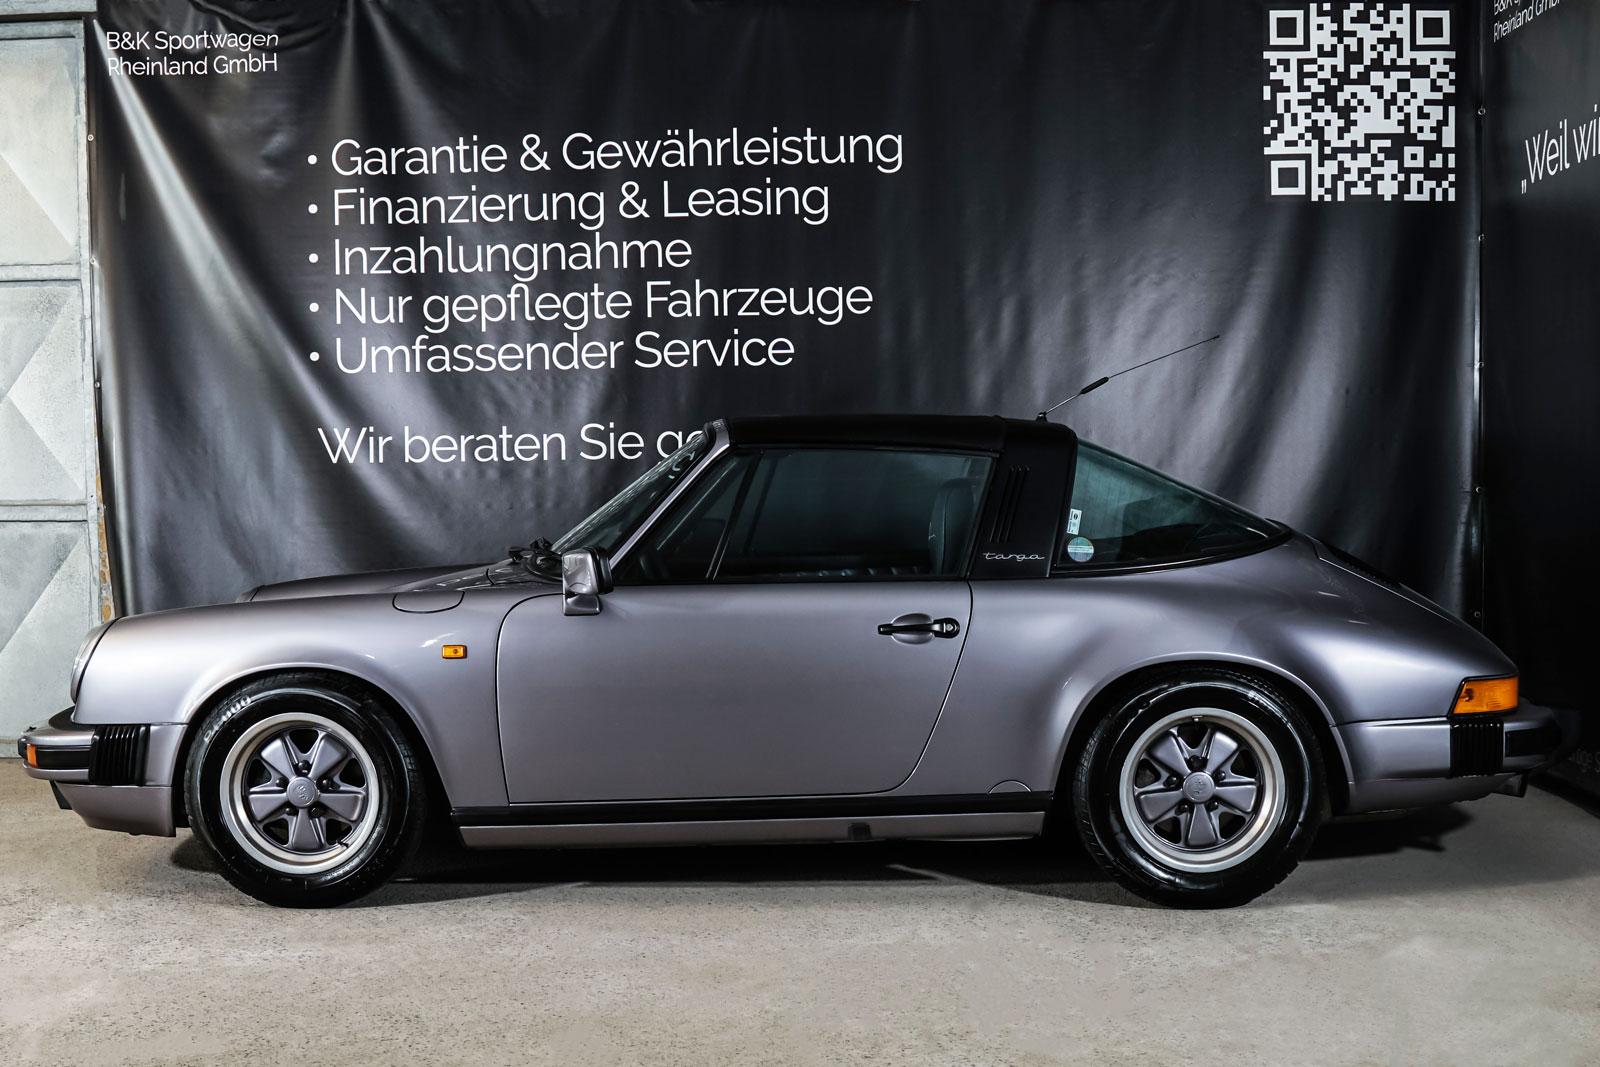 Porsche_911_Targa_Diamantblaumetallic_Blau_POR-0092_5_w